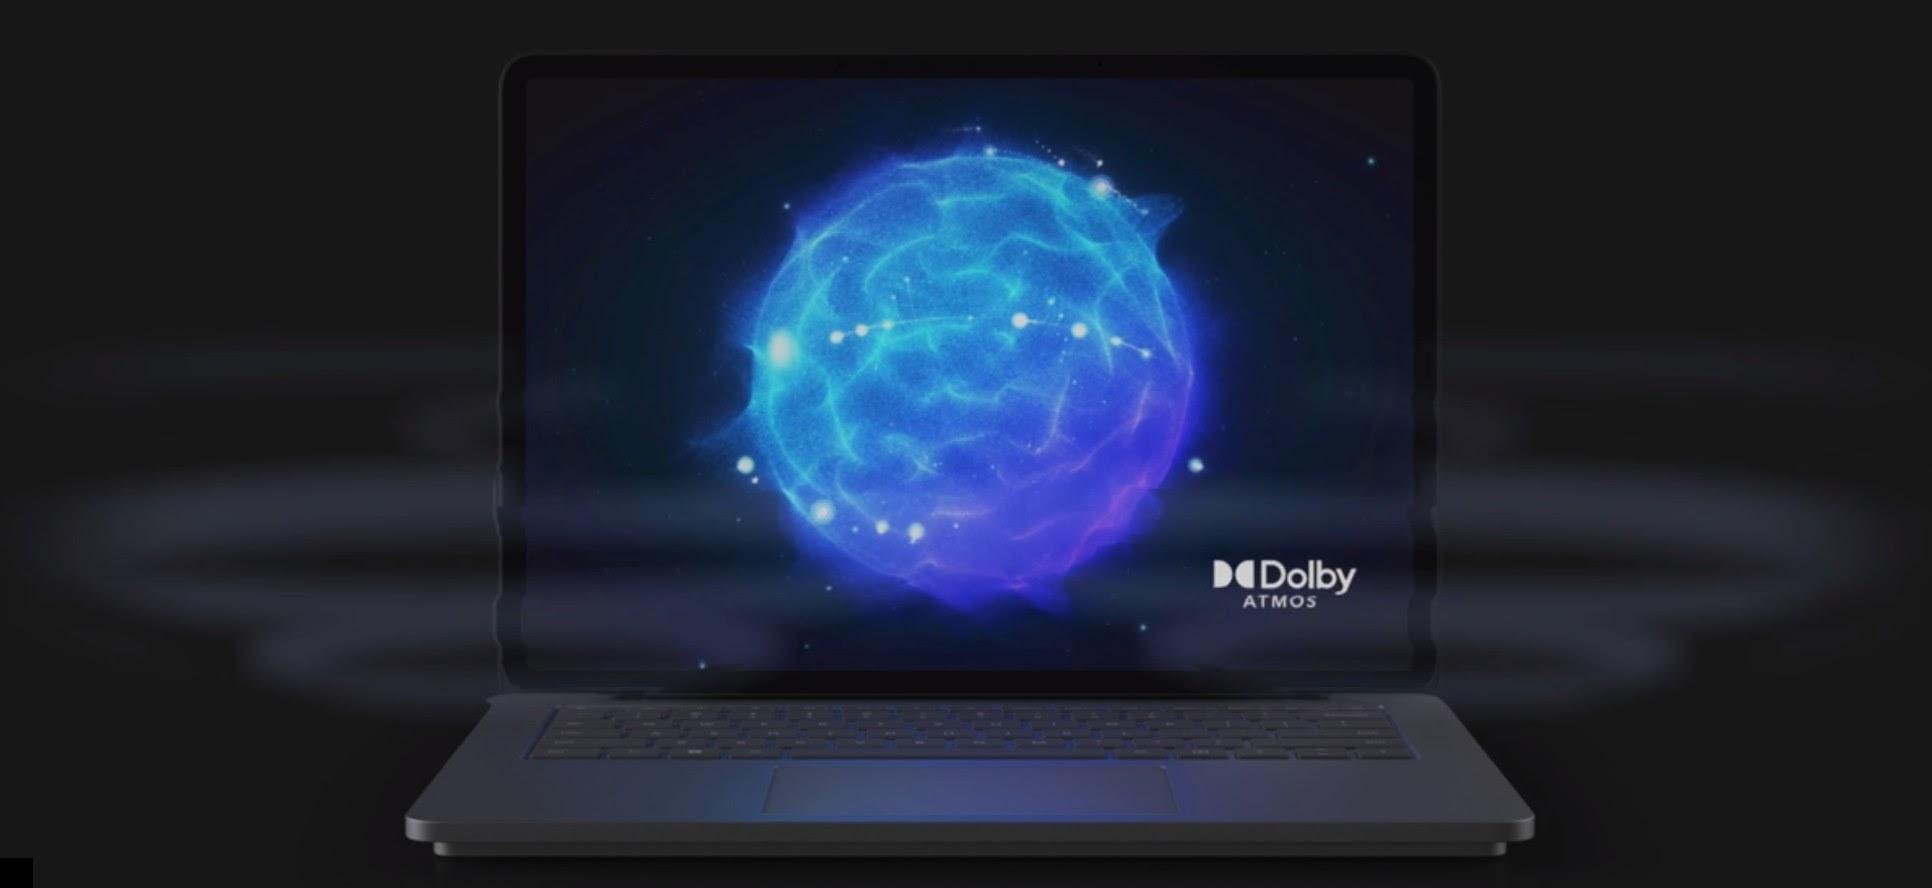 trai-nghiem-am-thanh-surface-laptop-studio